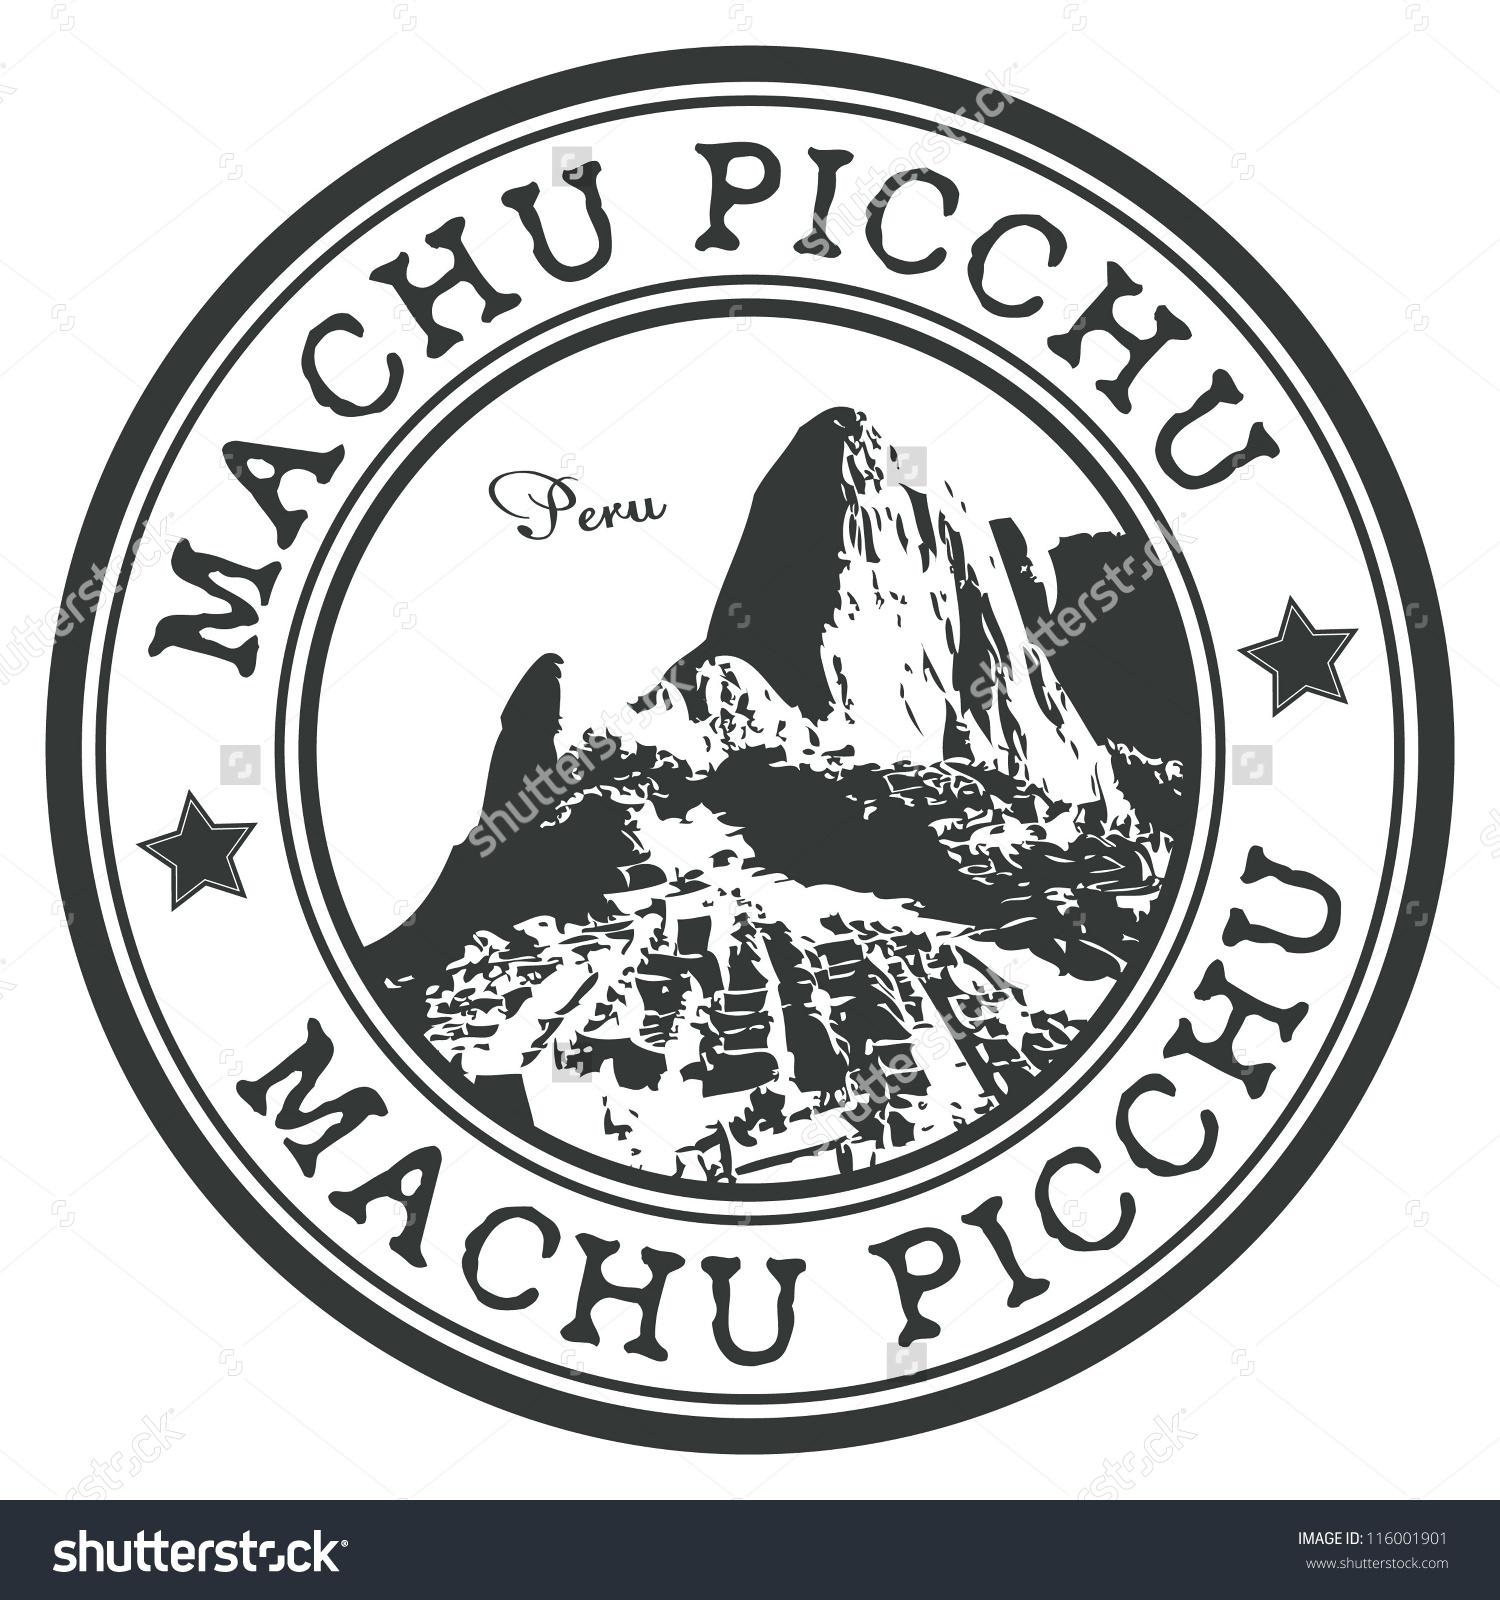 Machu Picchu Stamp Stock Vector 116001901.